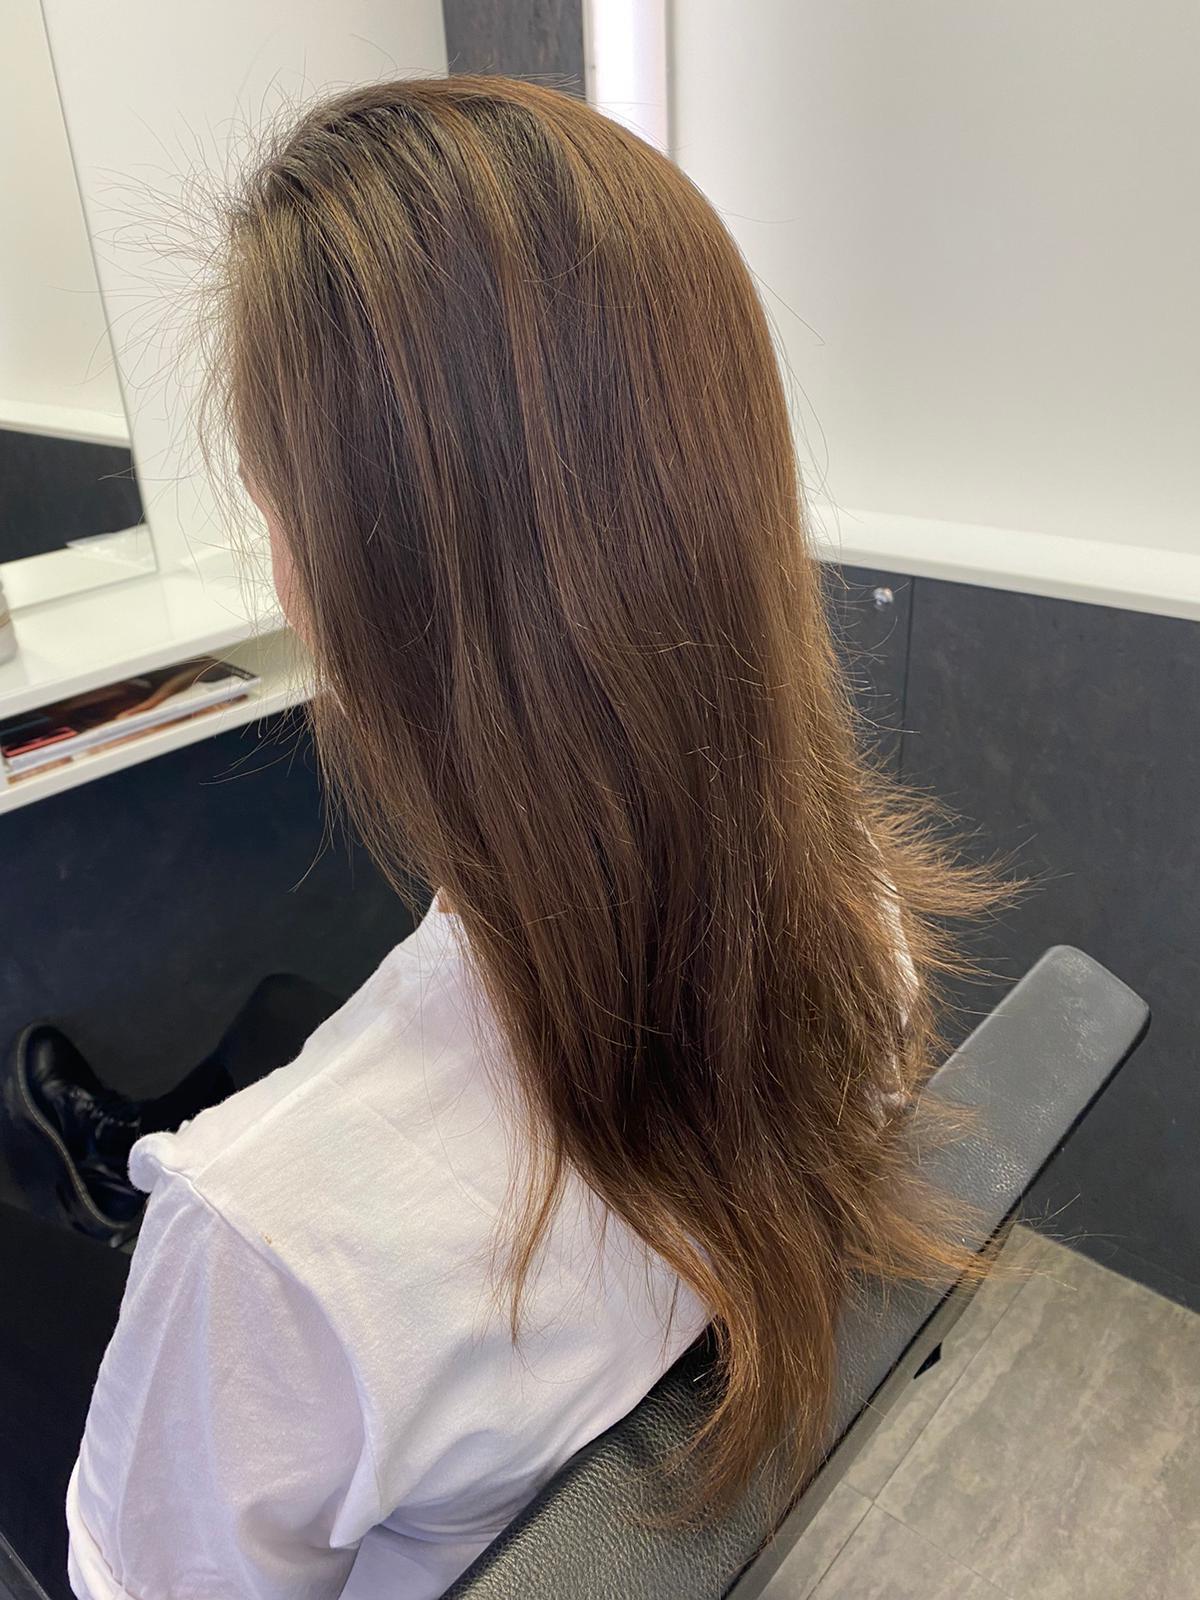 prodluzovani pred vlasu